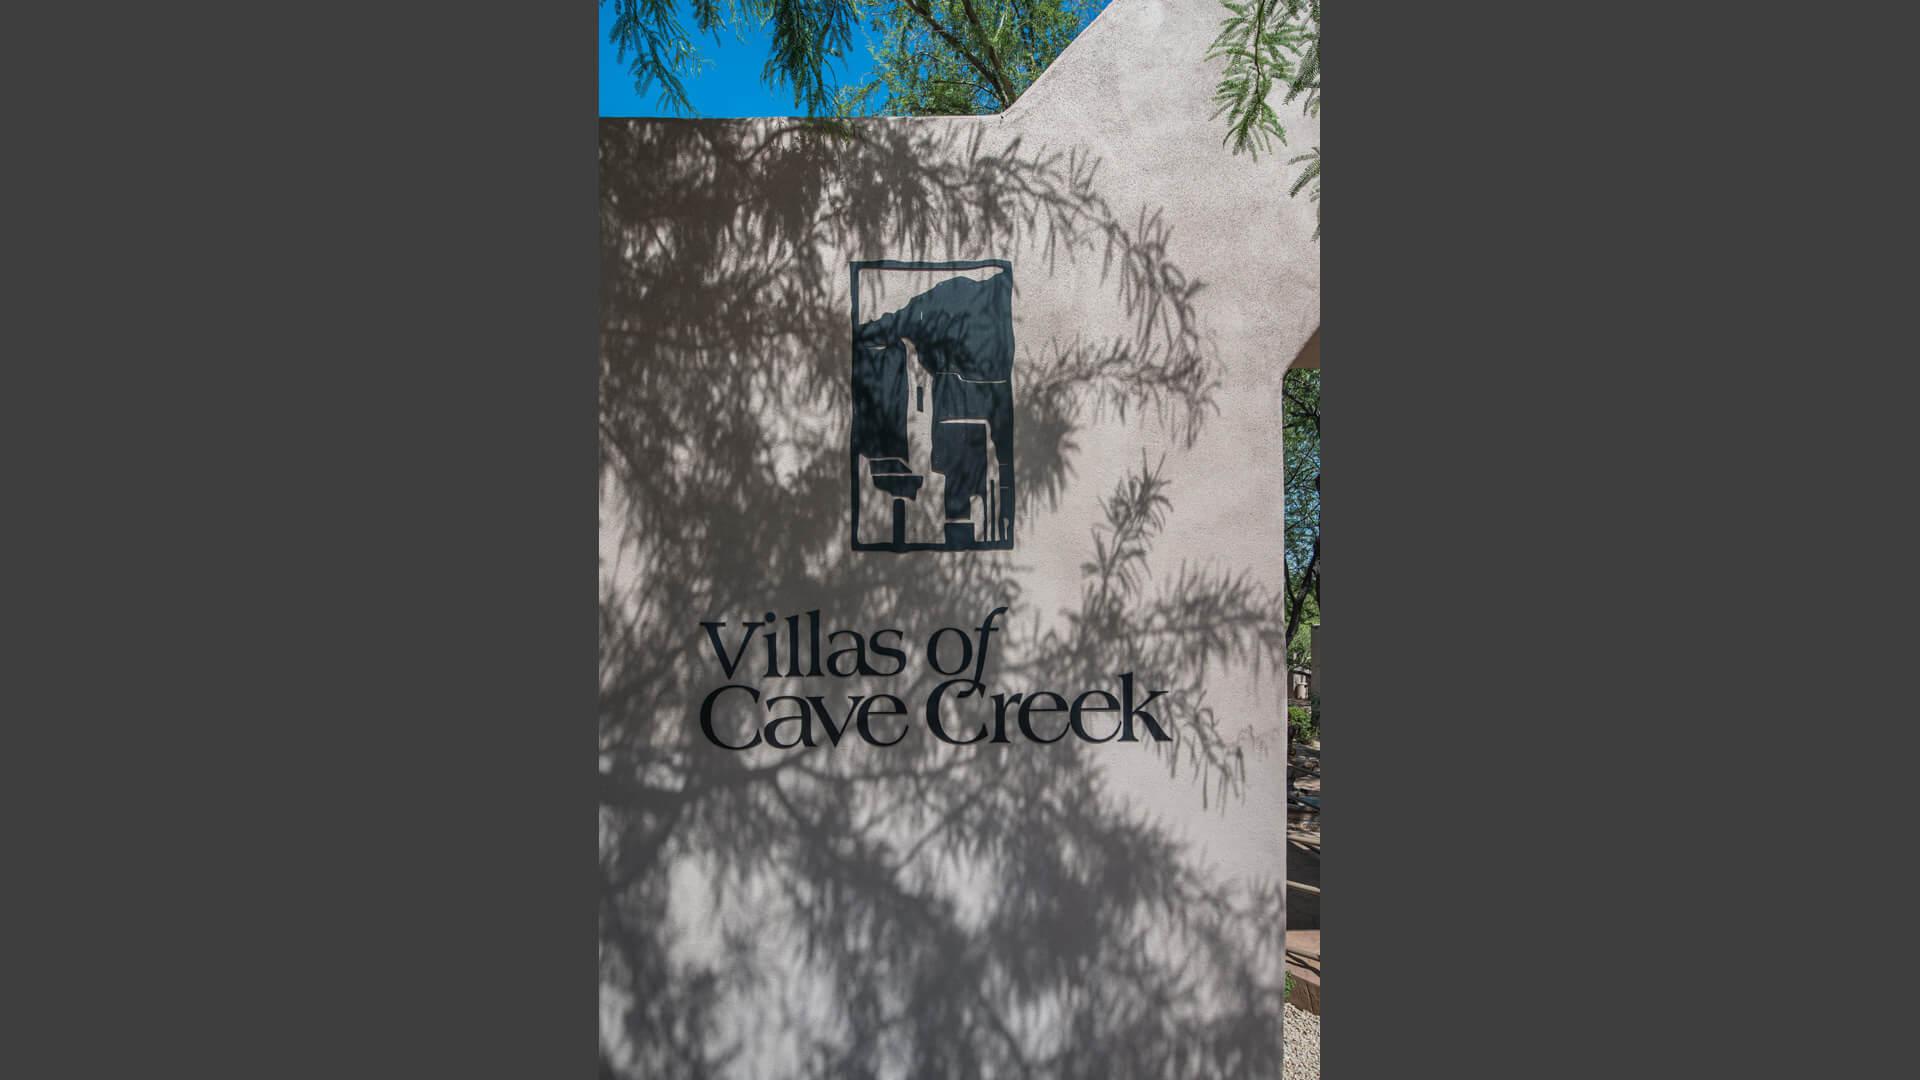 Villas Of Cave Creek Signage